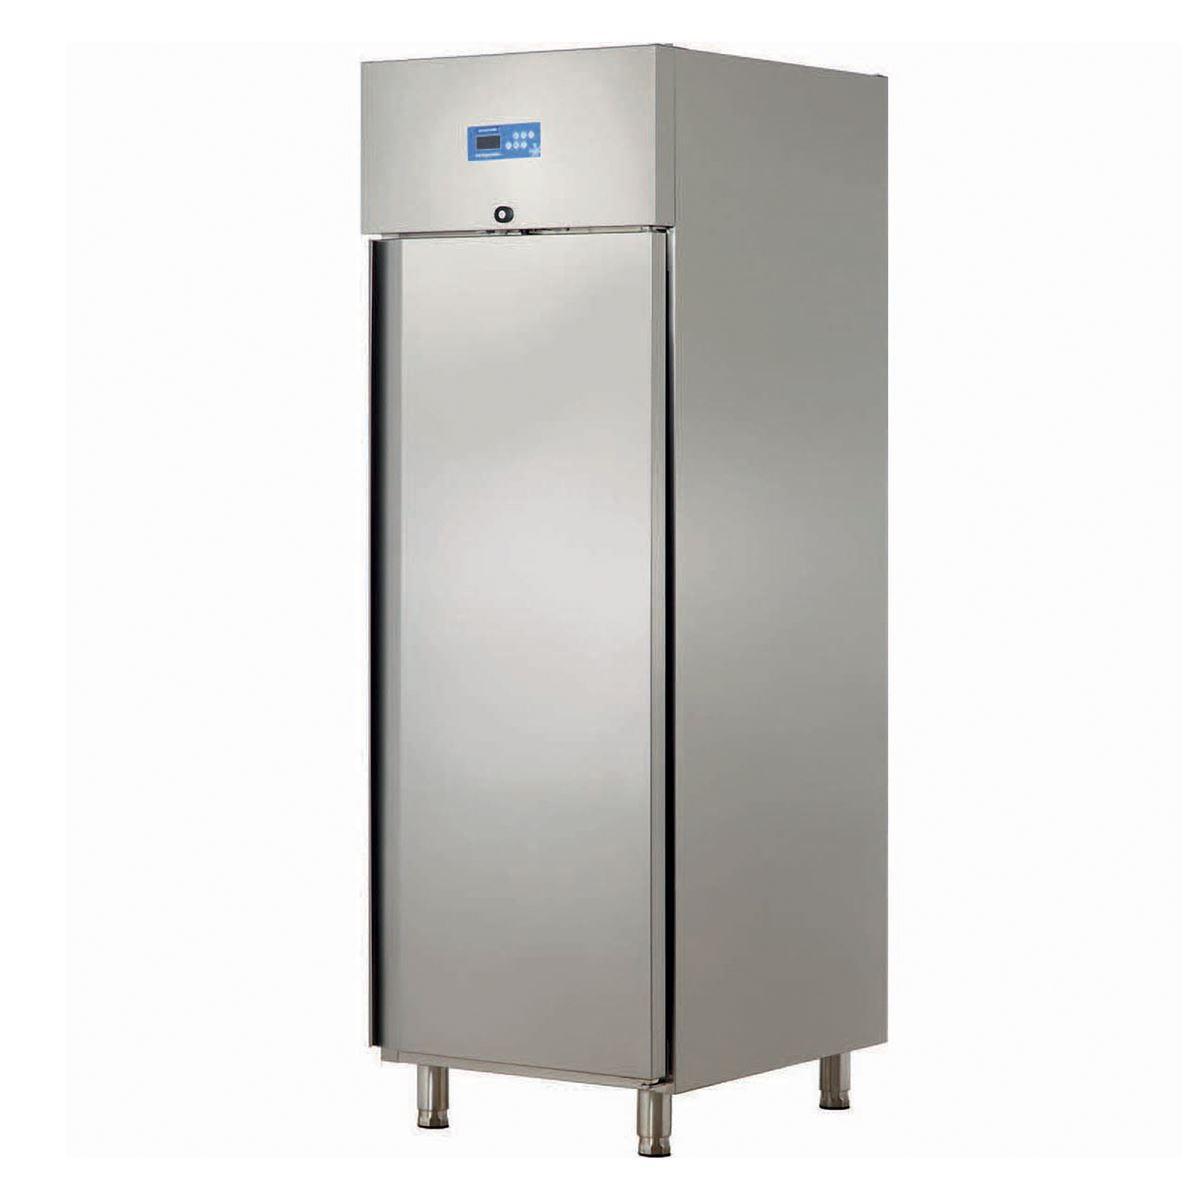 Шкаф морозильный OZTI GN 600.00 LMV